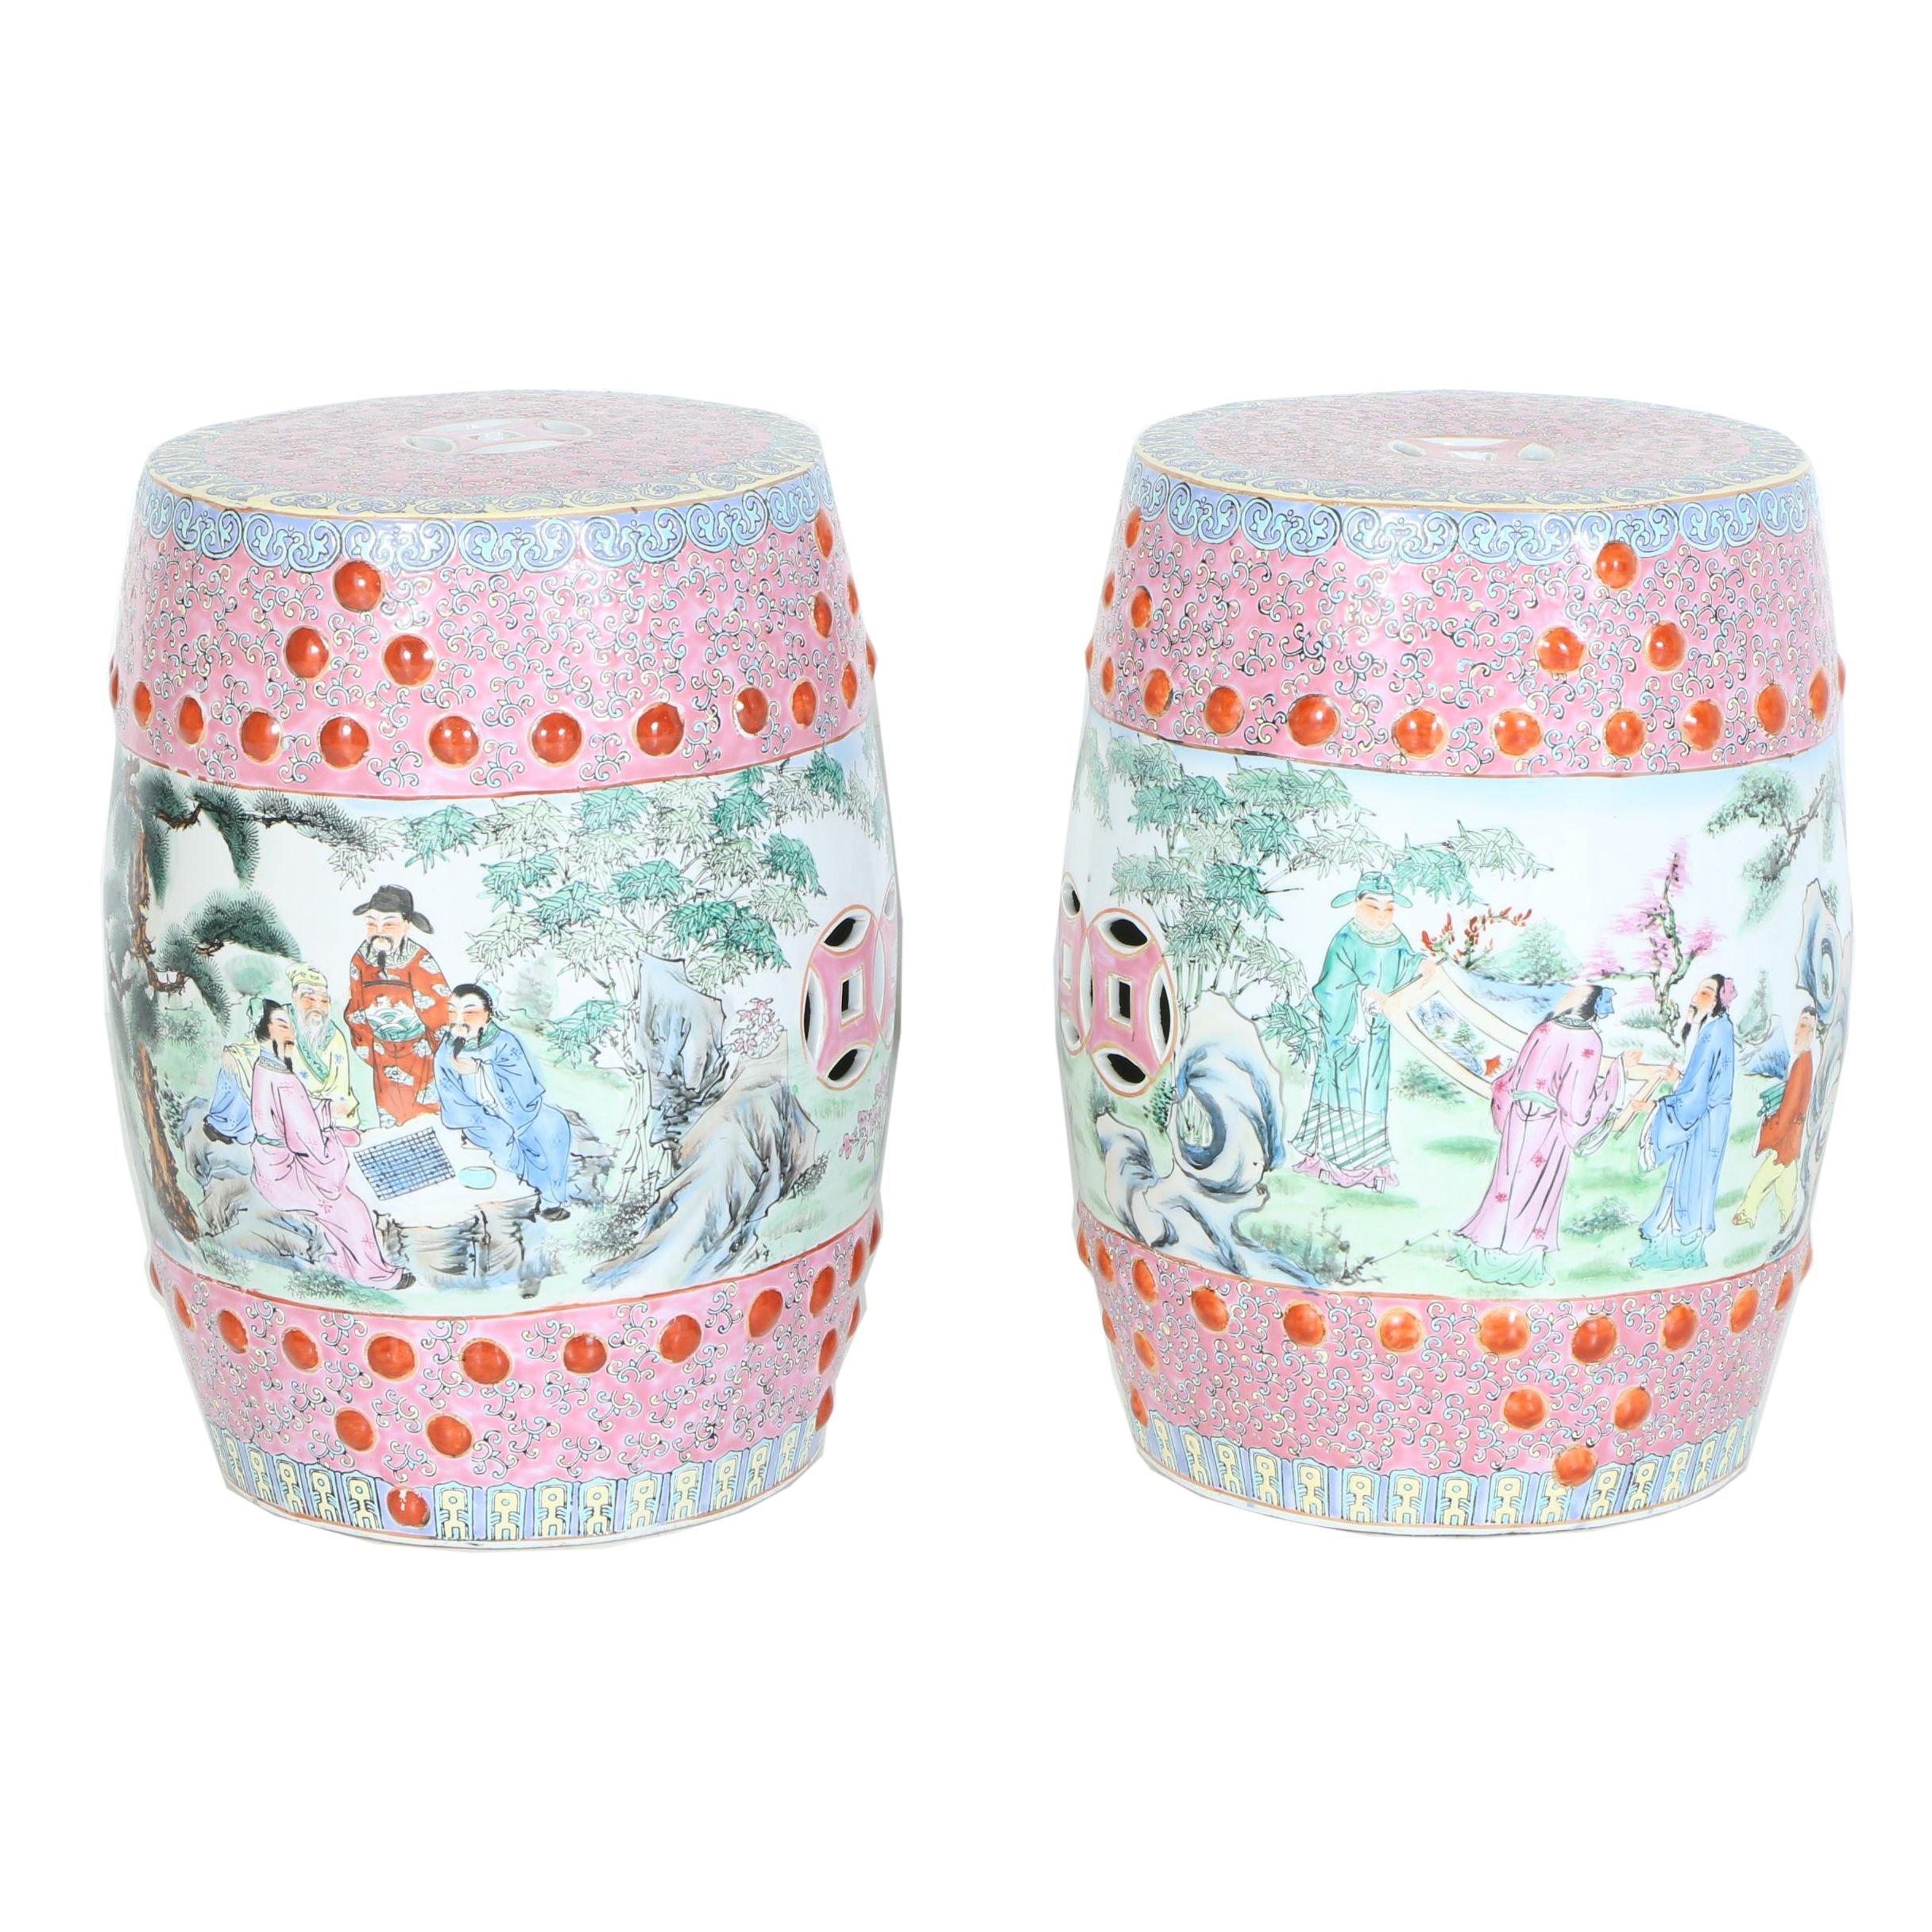 Chinese Painted Ceramic Garden Stools